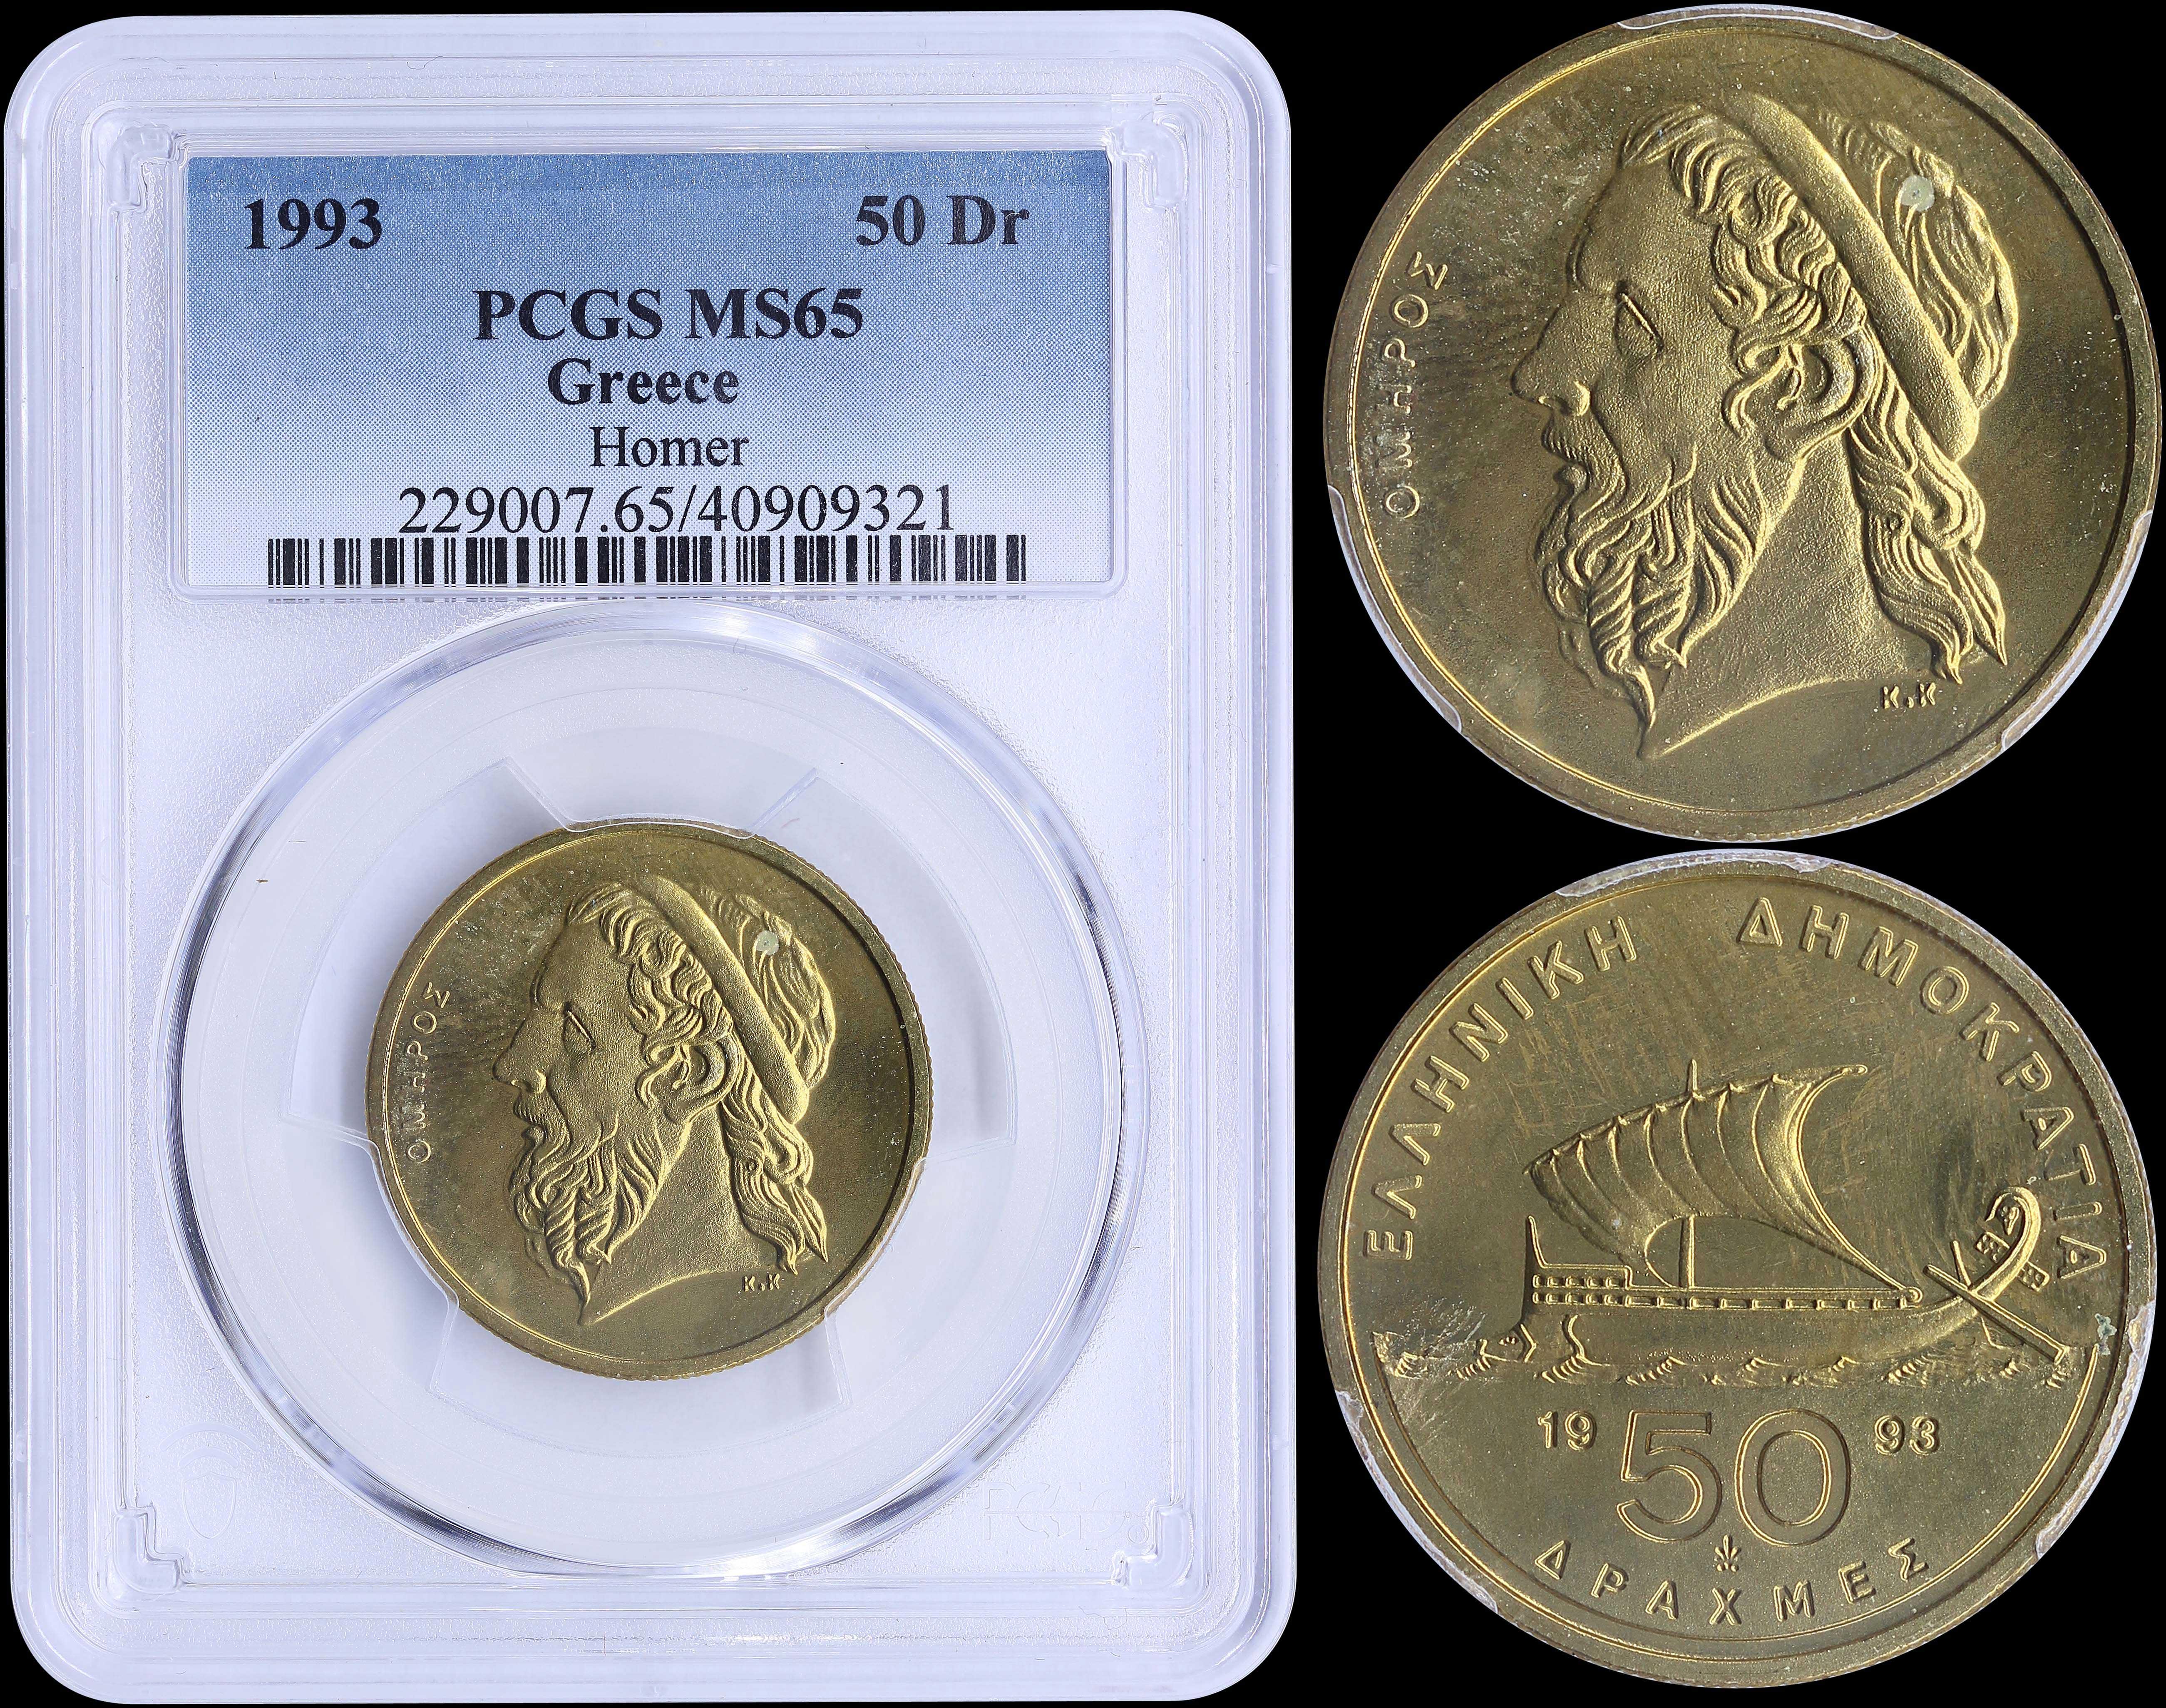 Lot 6227 - -  COINS & TOKENS HELLENIC REPUBLIC & COMMEMORATIVE ISSUES -  A. Karamitsos Public & Live Internet Auction 682 (Part A) Coins, Medals & Banknotes